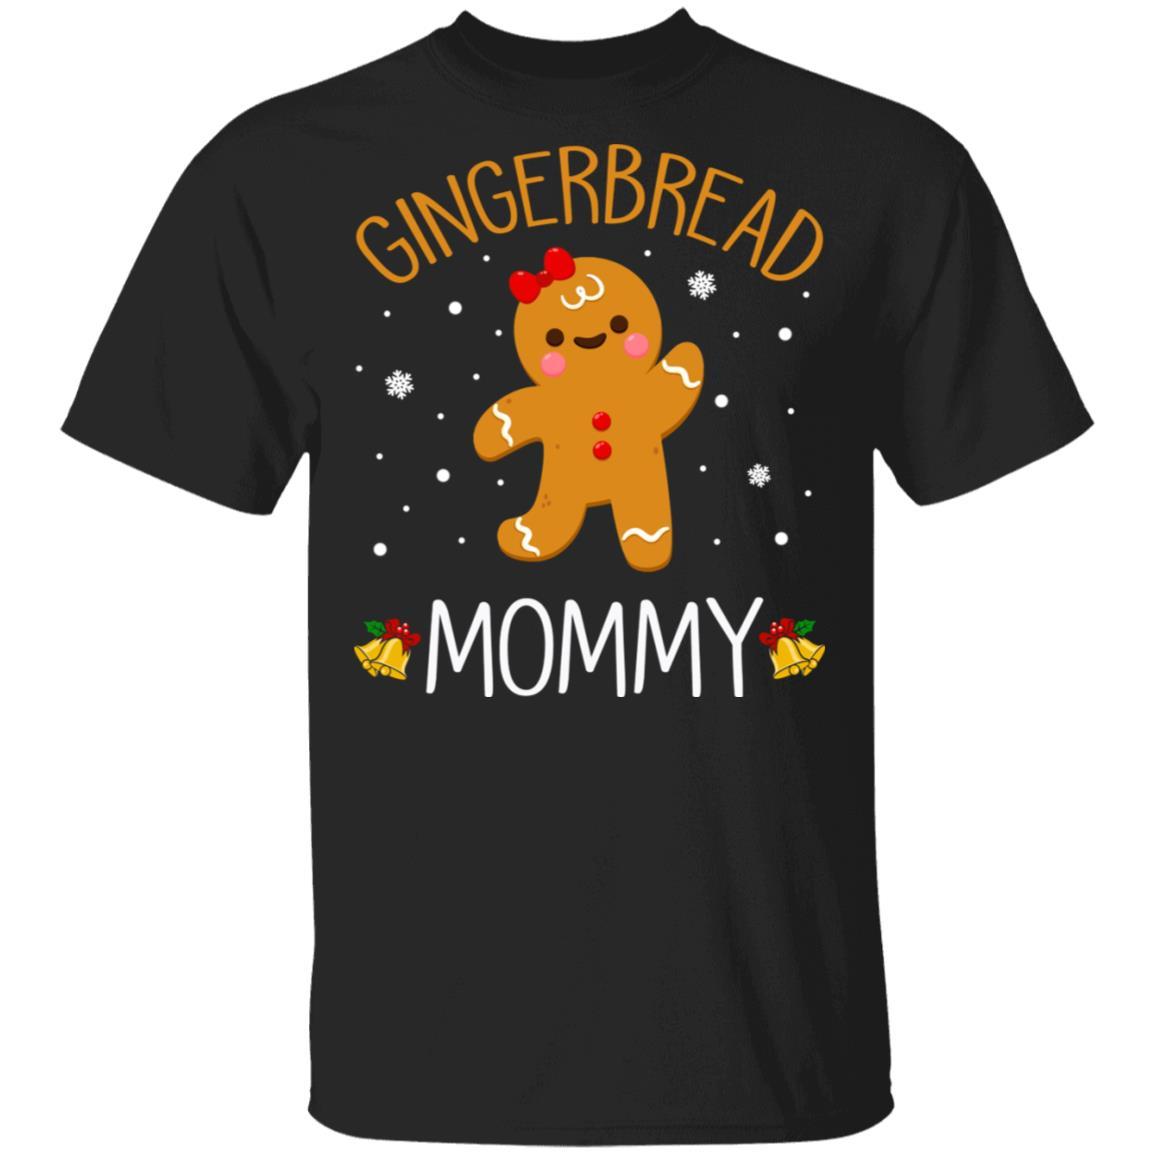 Xmas Cute Gingerbread Men Mommy Christmas Family Unisex Short Sleeve